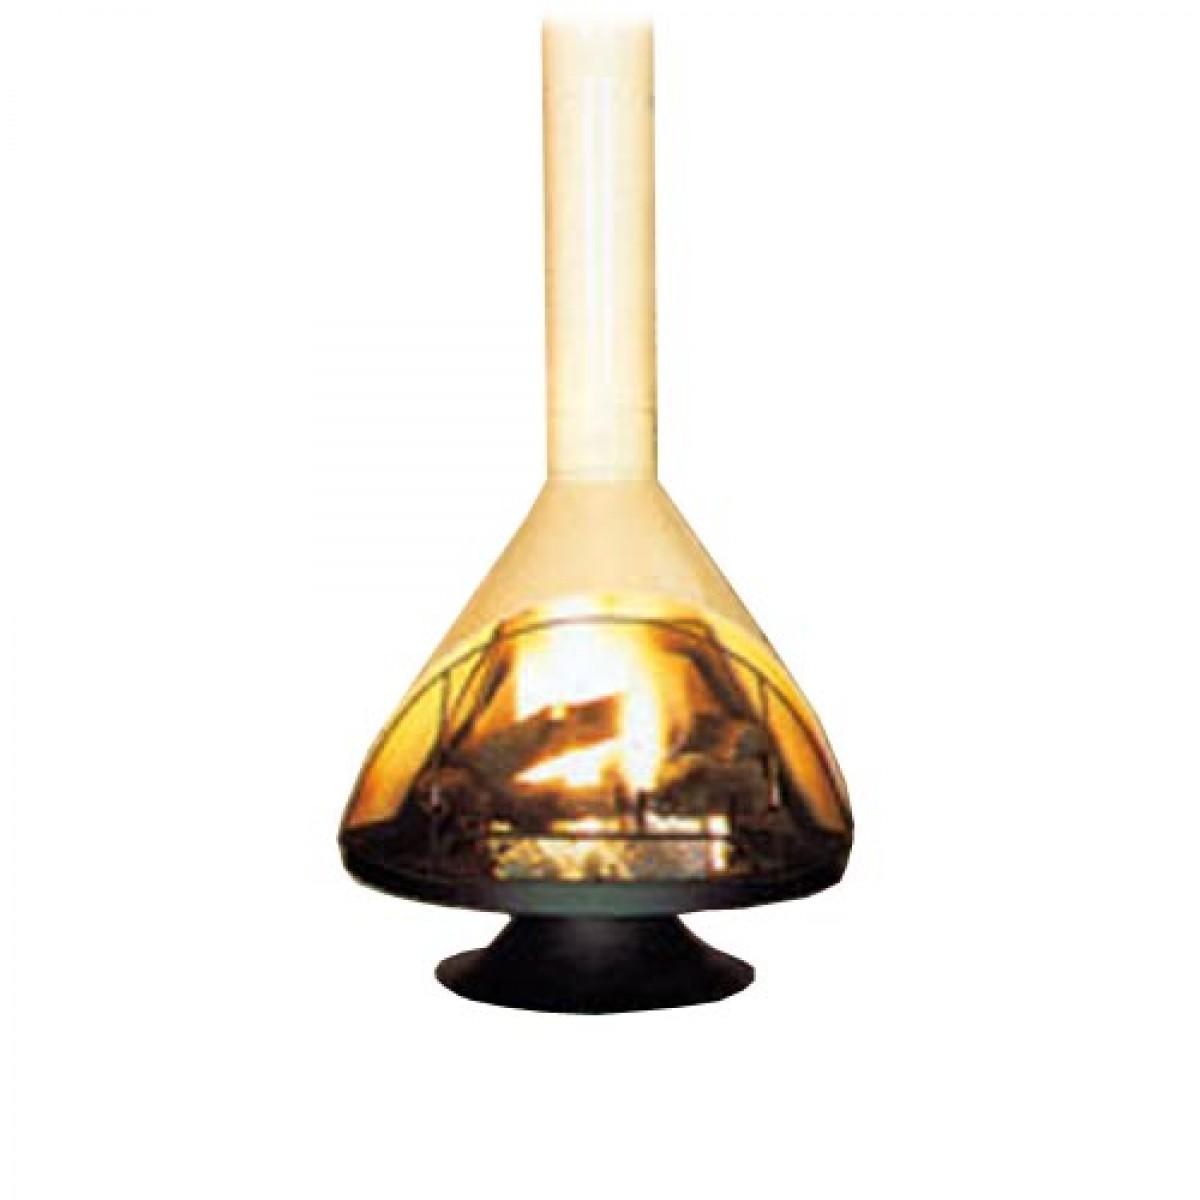 malm wood stoves malm gas fireplaces free standing stove